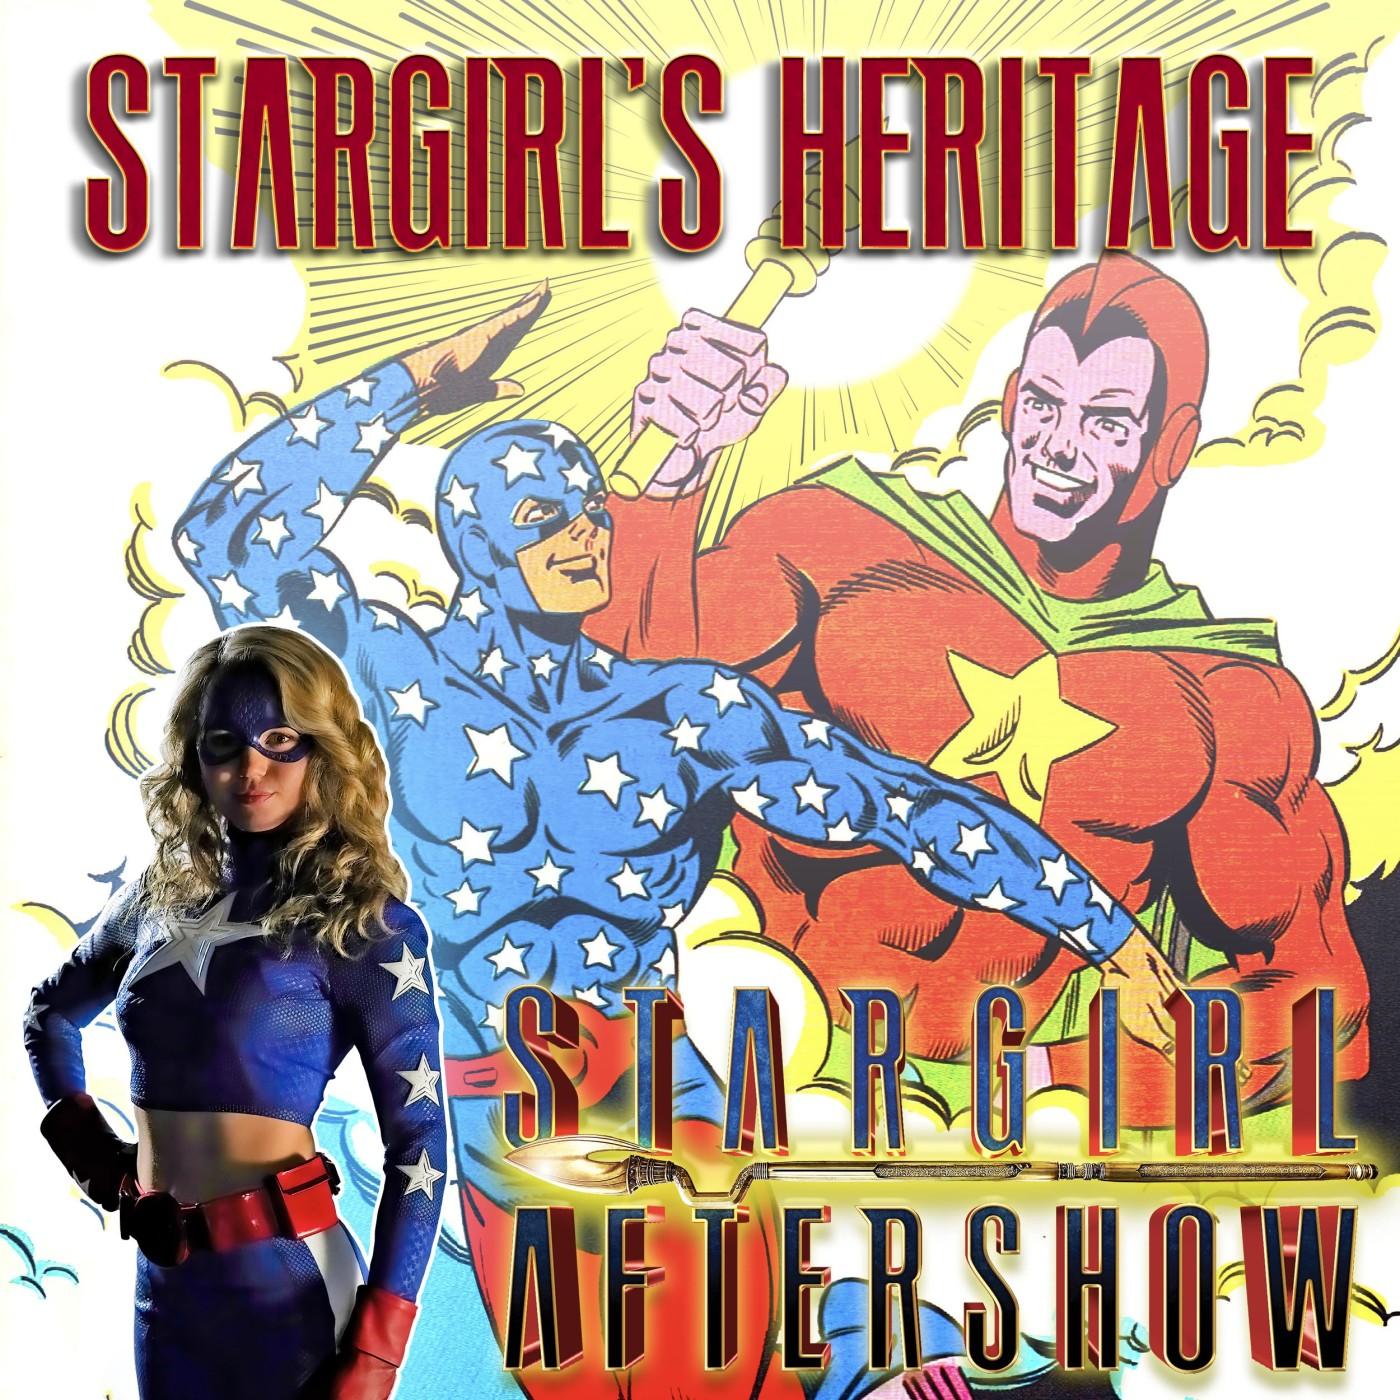 Season 0 – Episode 2: Stargirl's Heritage